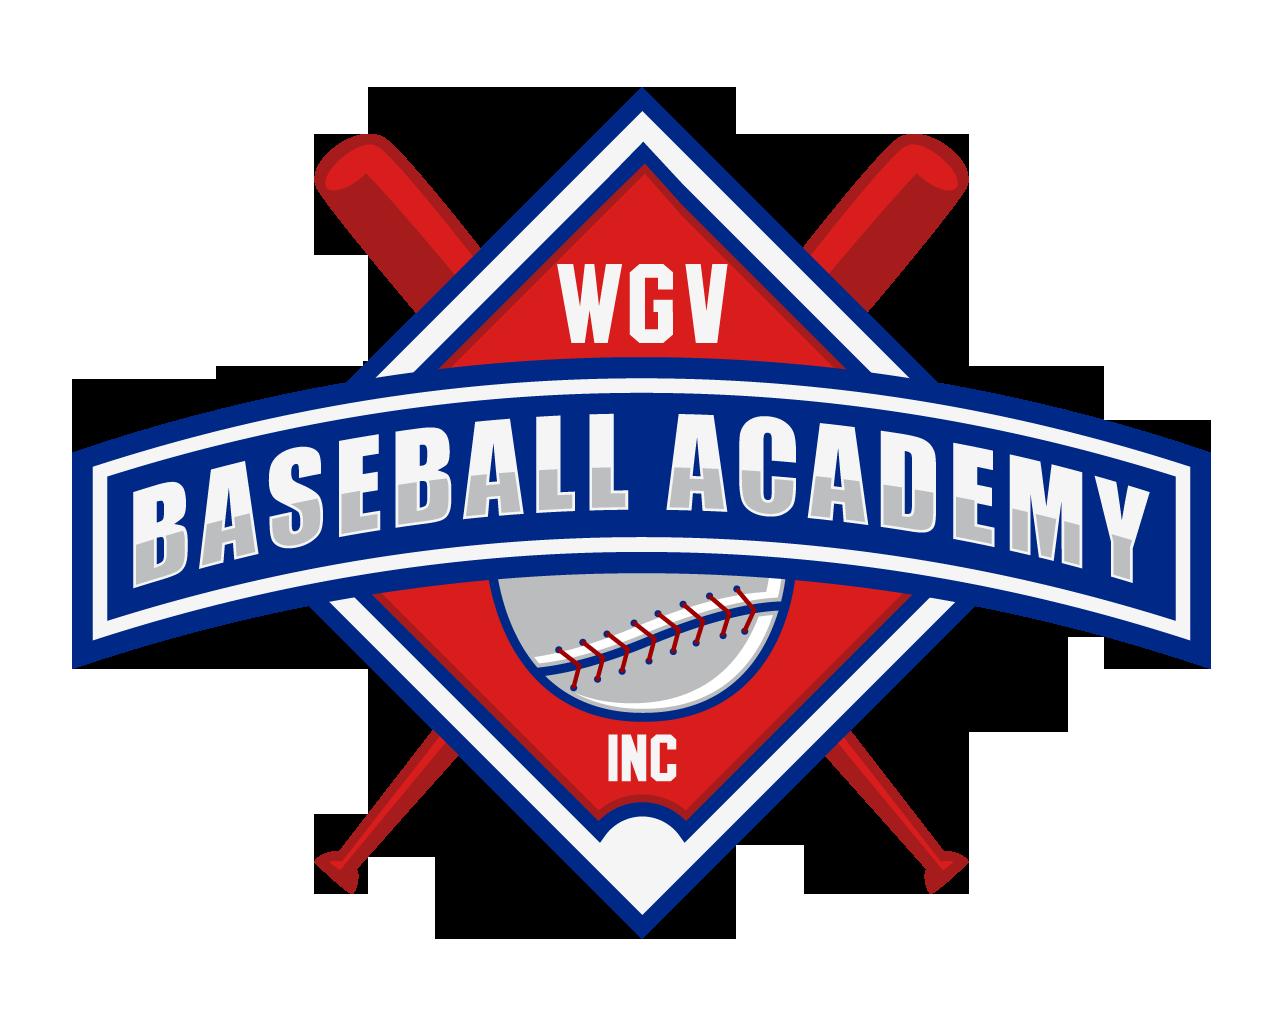 WGV Baseball Academy